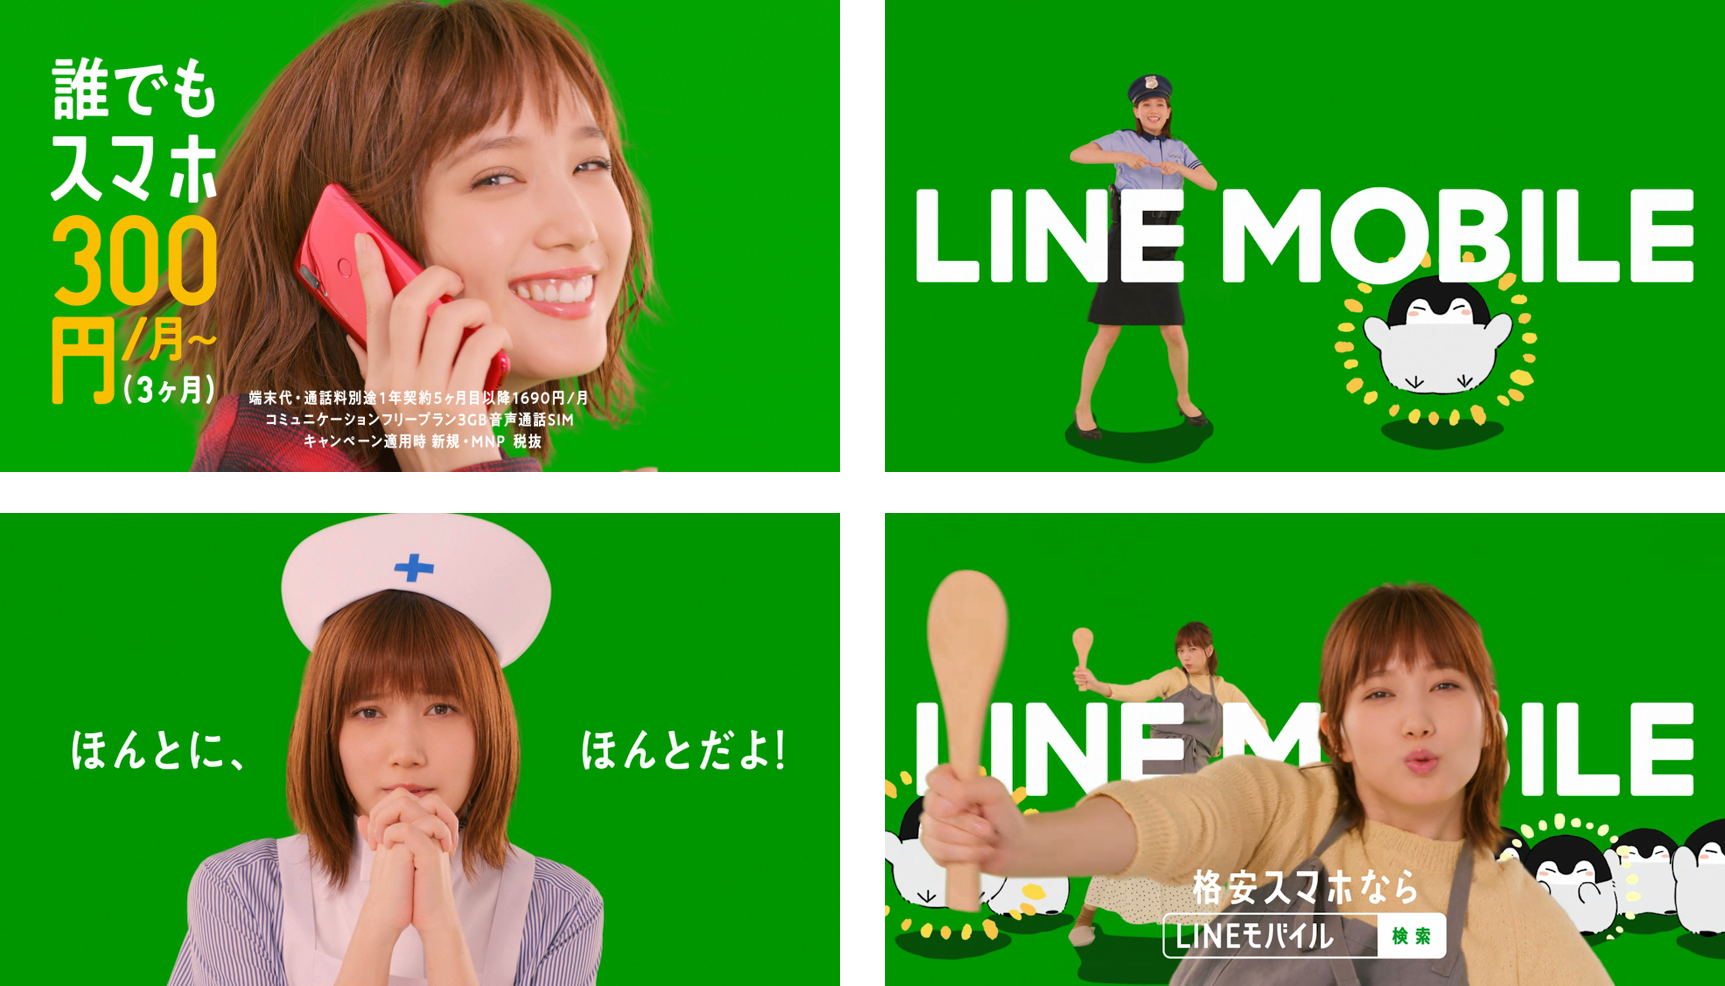 /stf/linecorp/ja/pr/linemobilecm_01.png